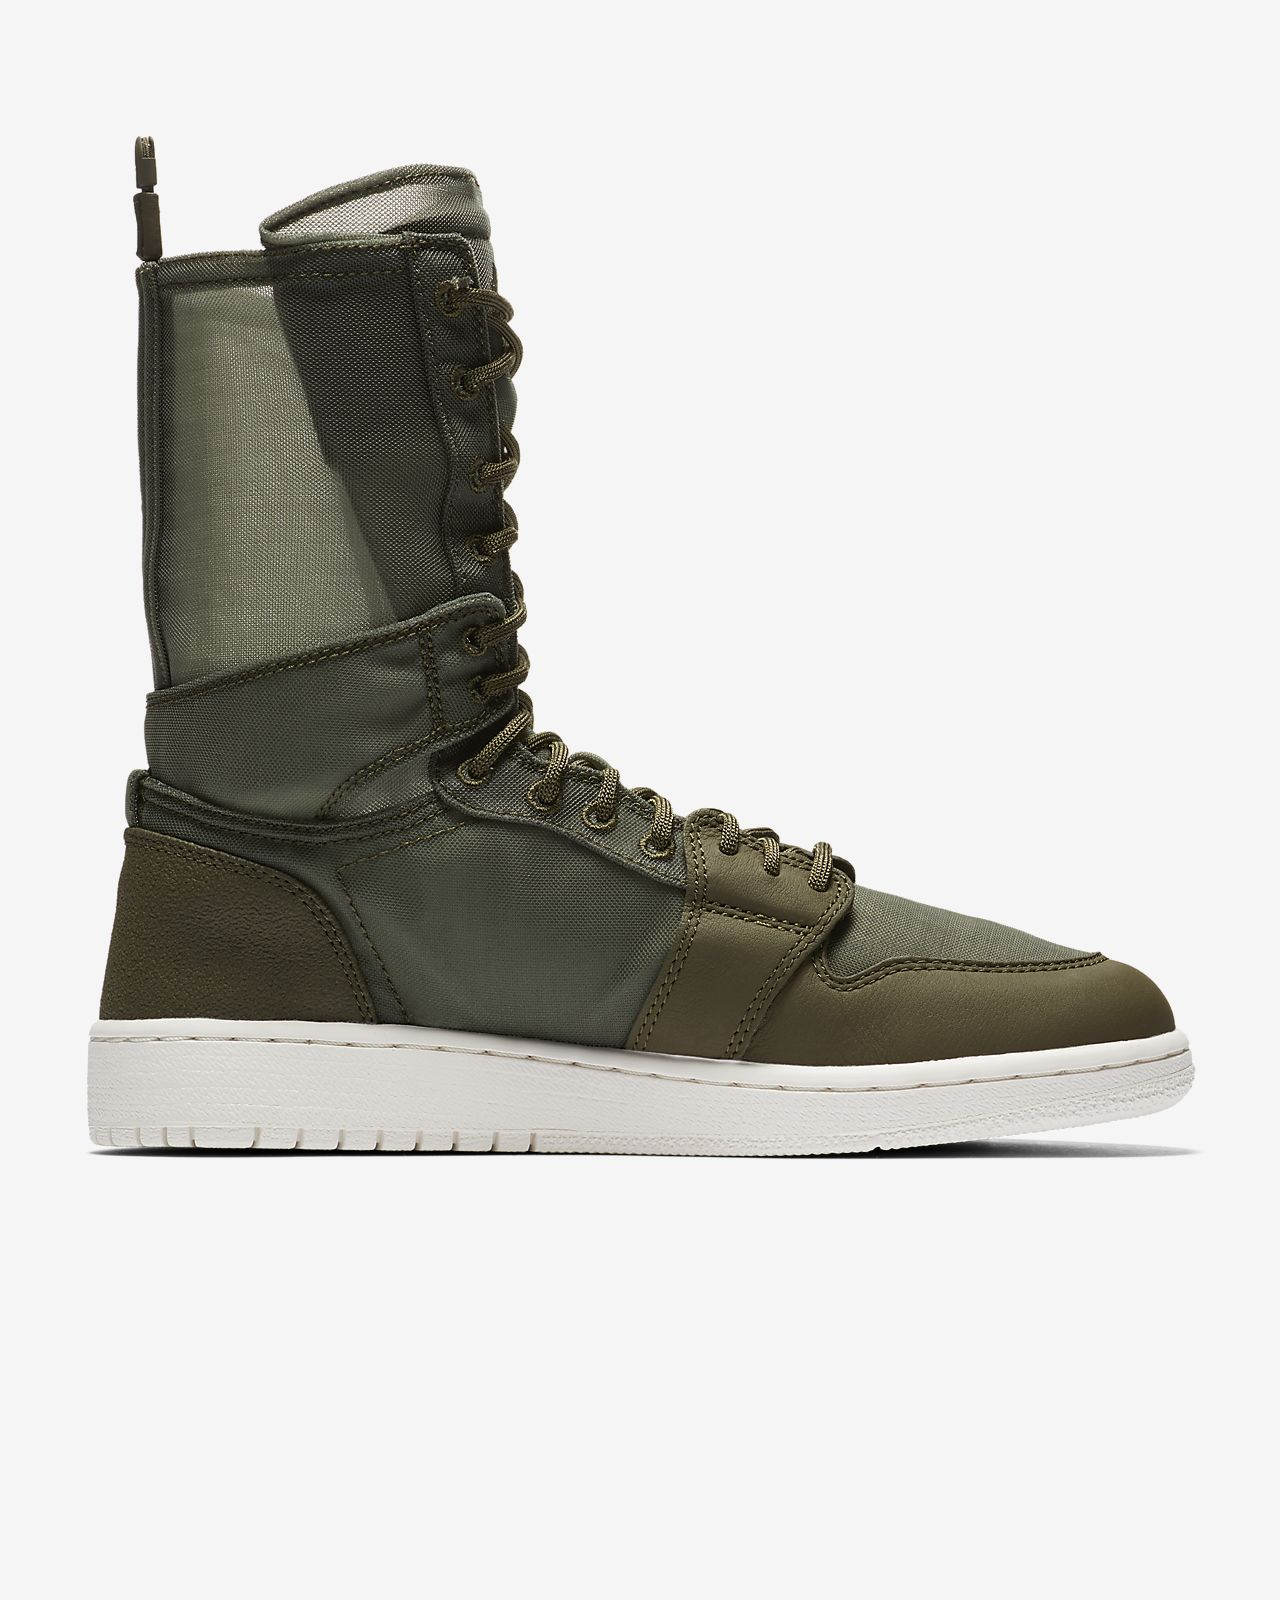 7db6c3881496d Air Jordan 1 Explorer XX Women's Shoe. Nike.com CA